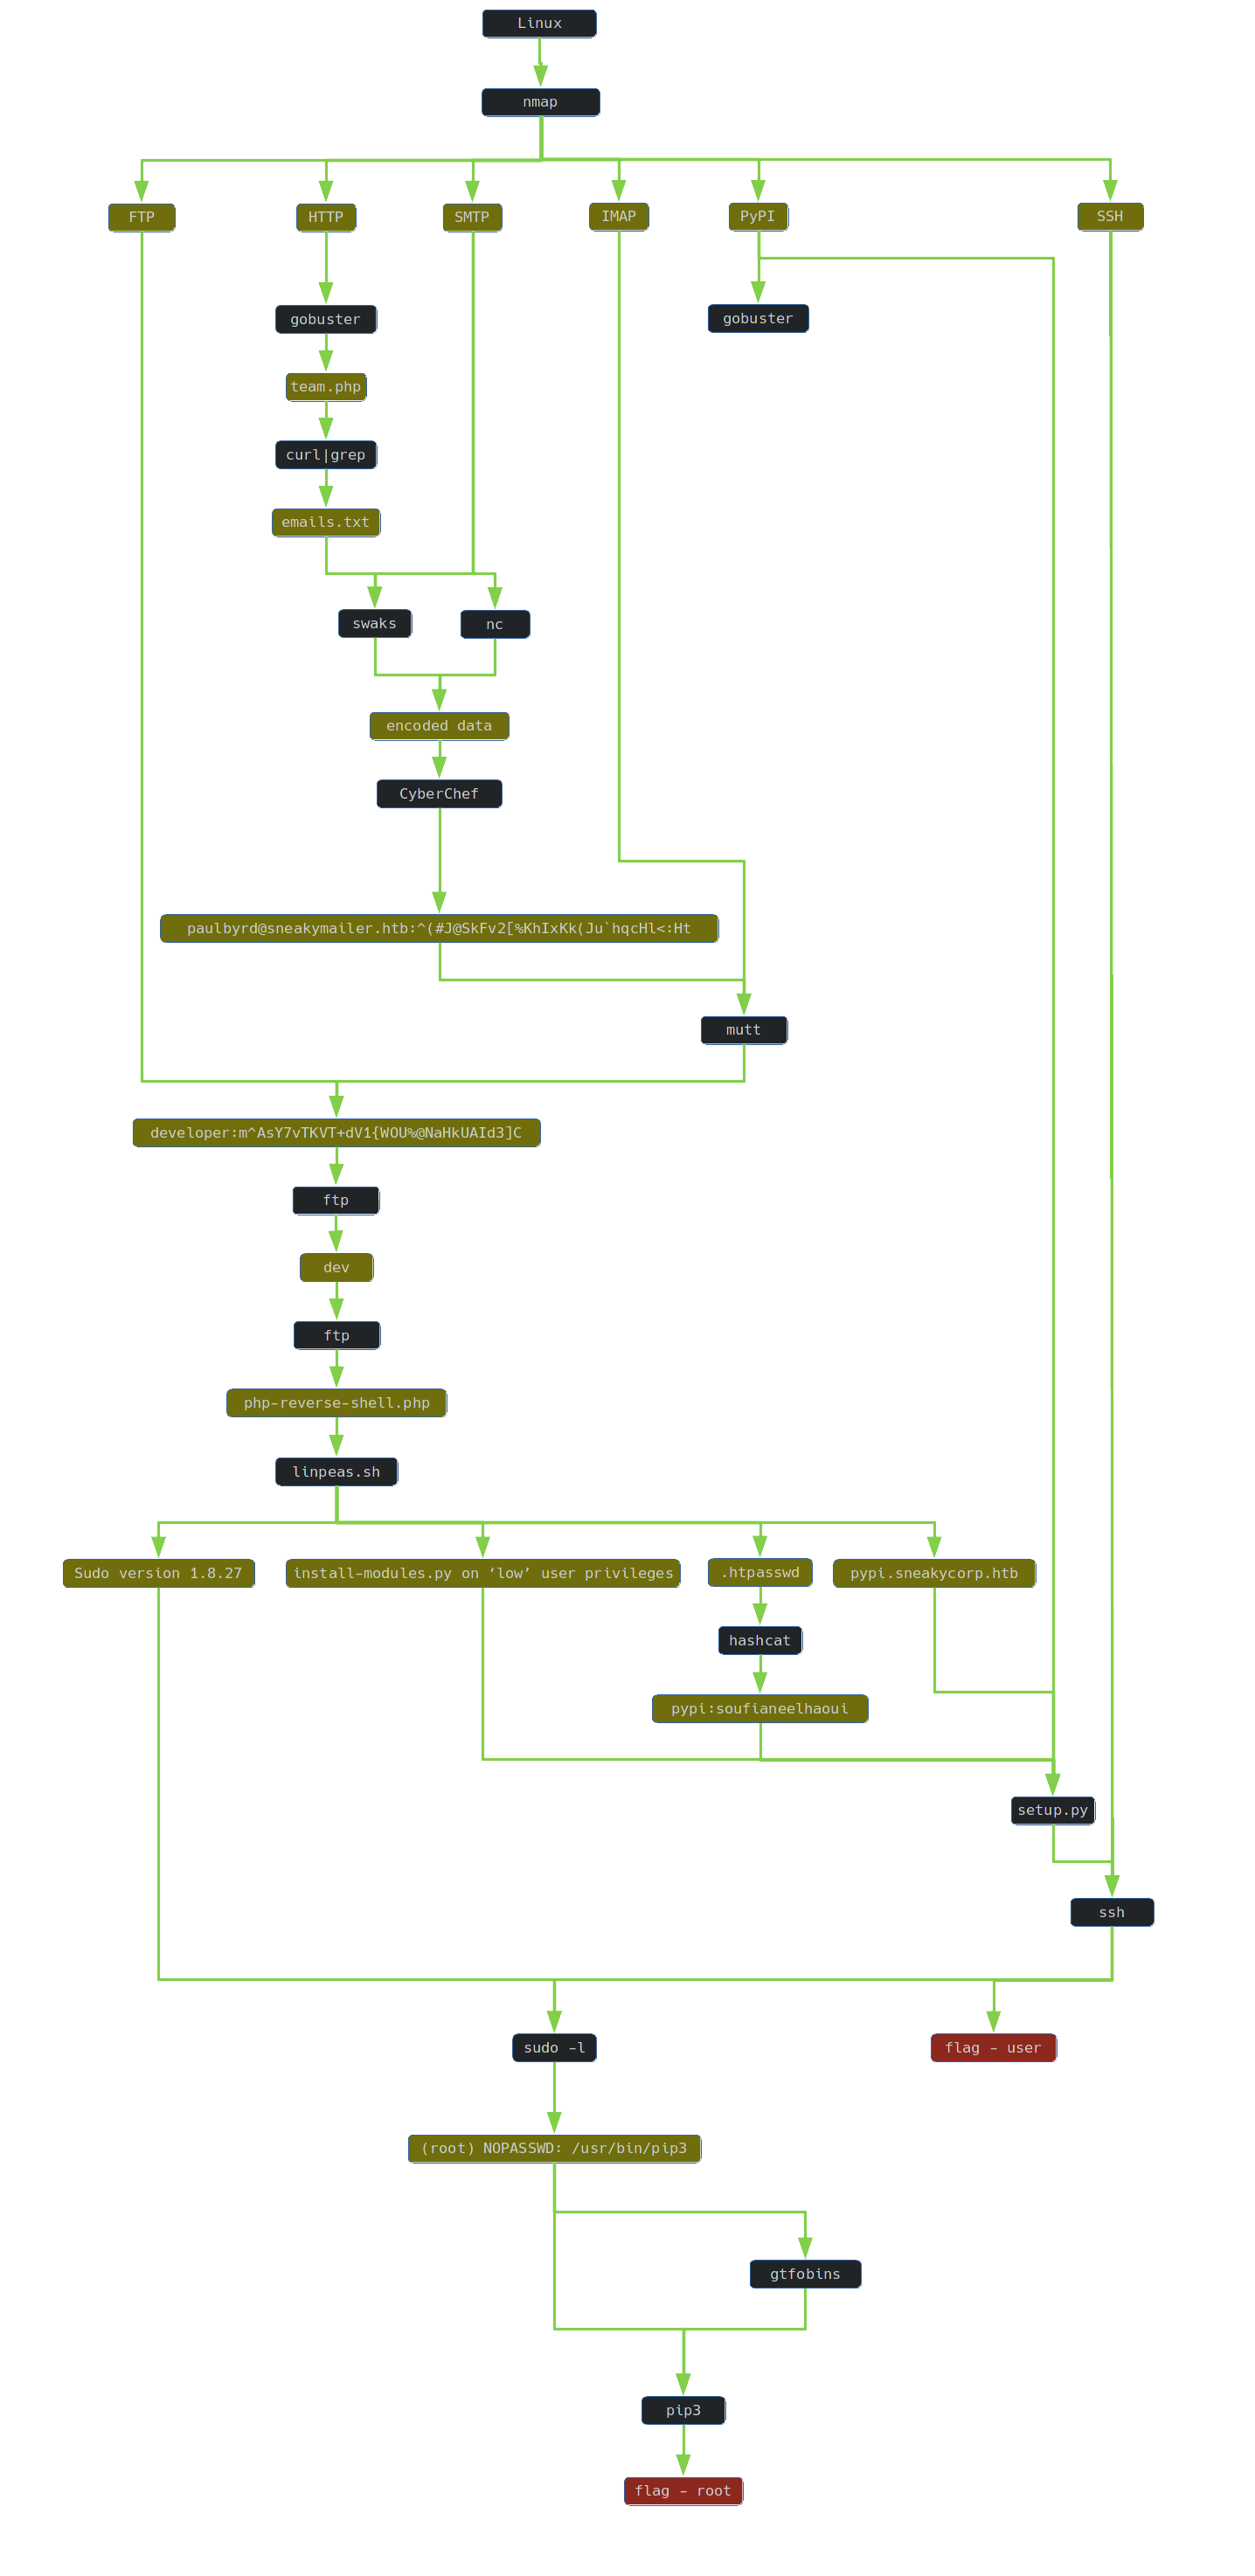 SneakyMailer graph